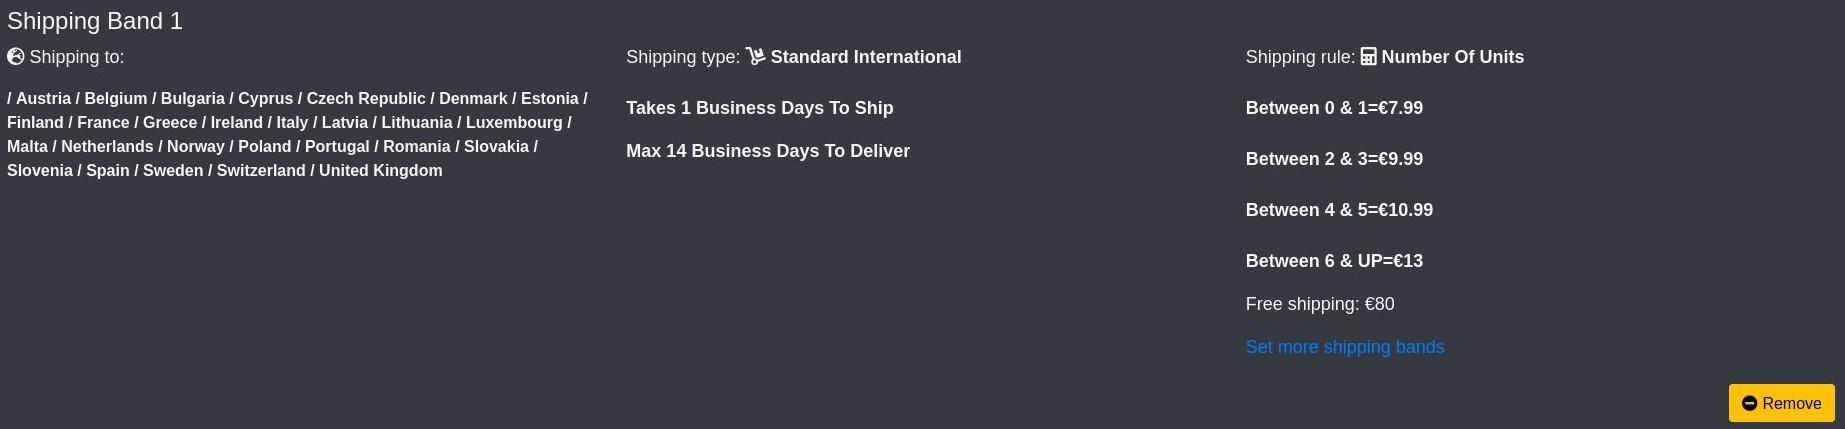 create a shop - shipping band